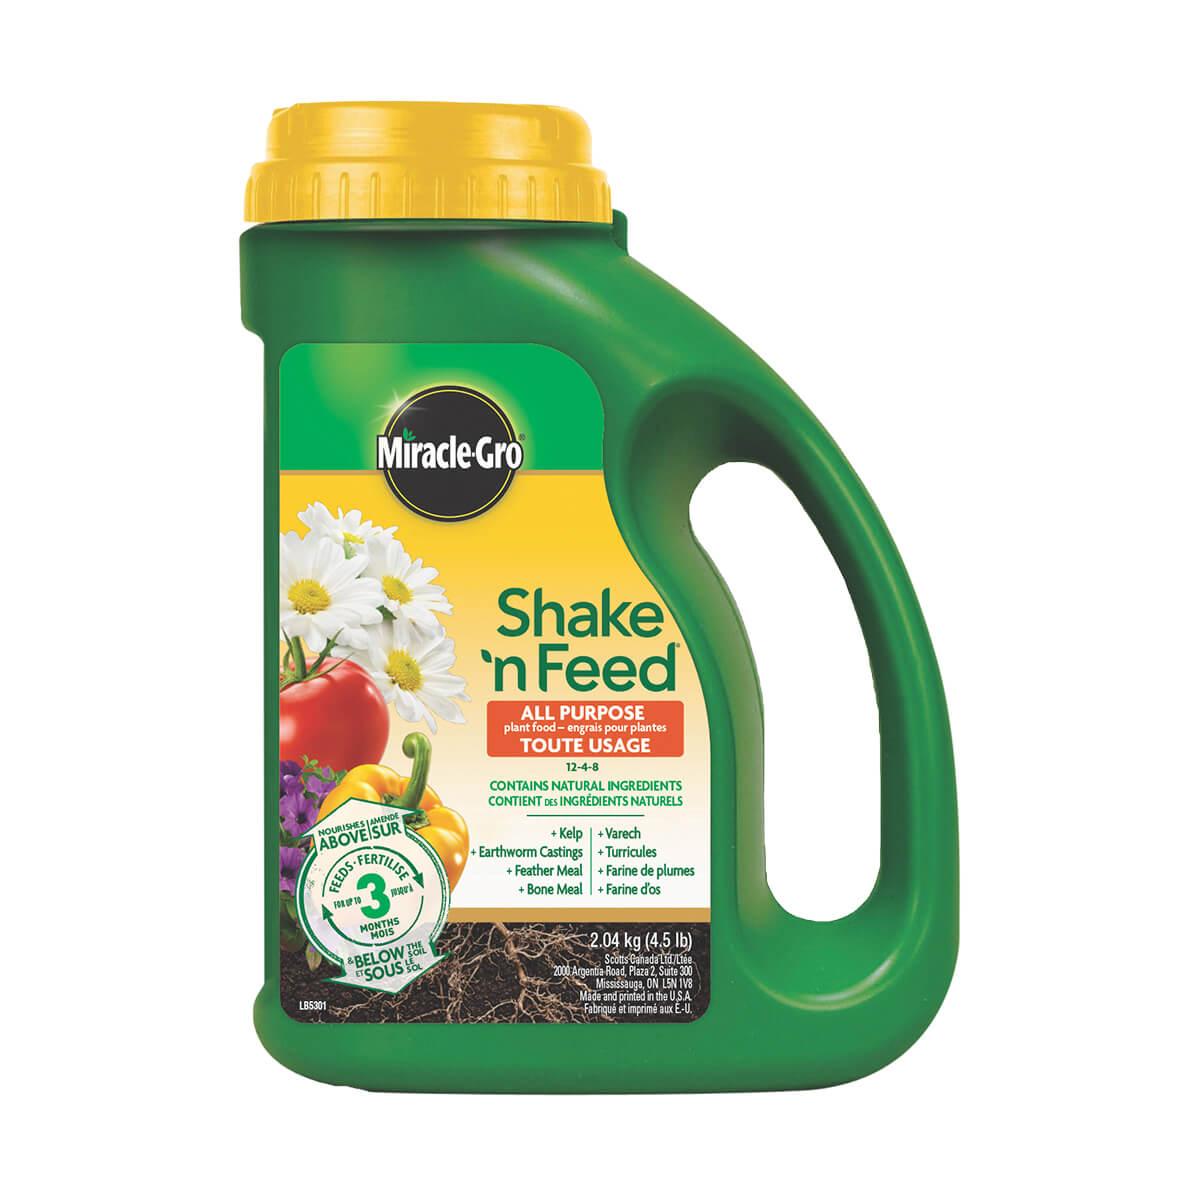 Miracle-Gro Shake 'n Feed All Purpose - 2.04 kg